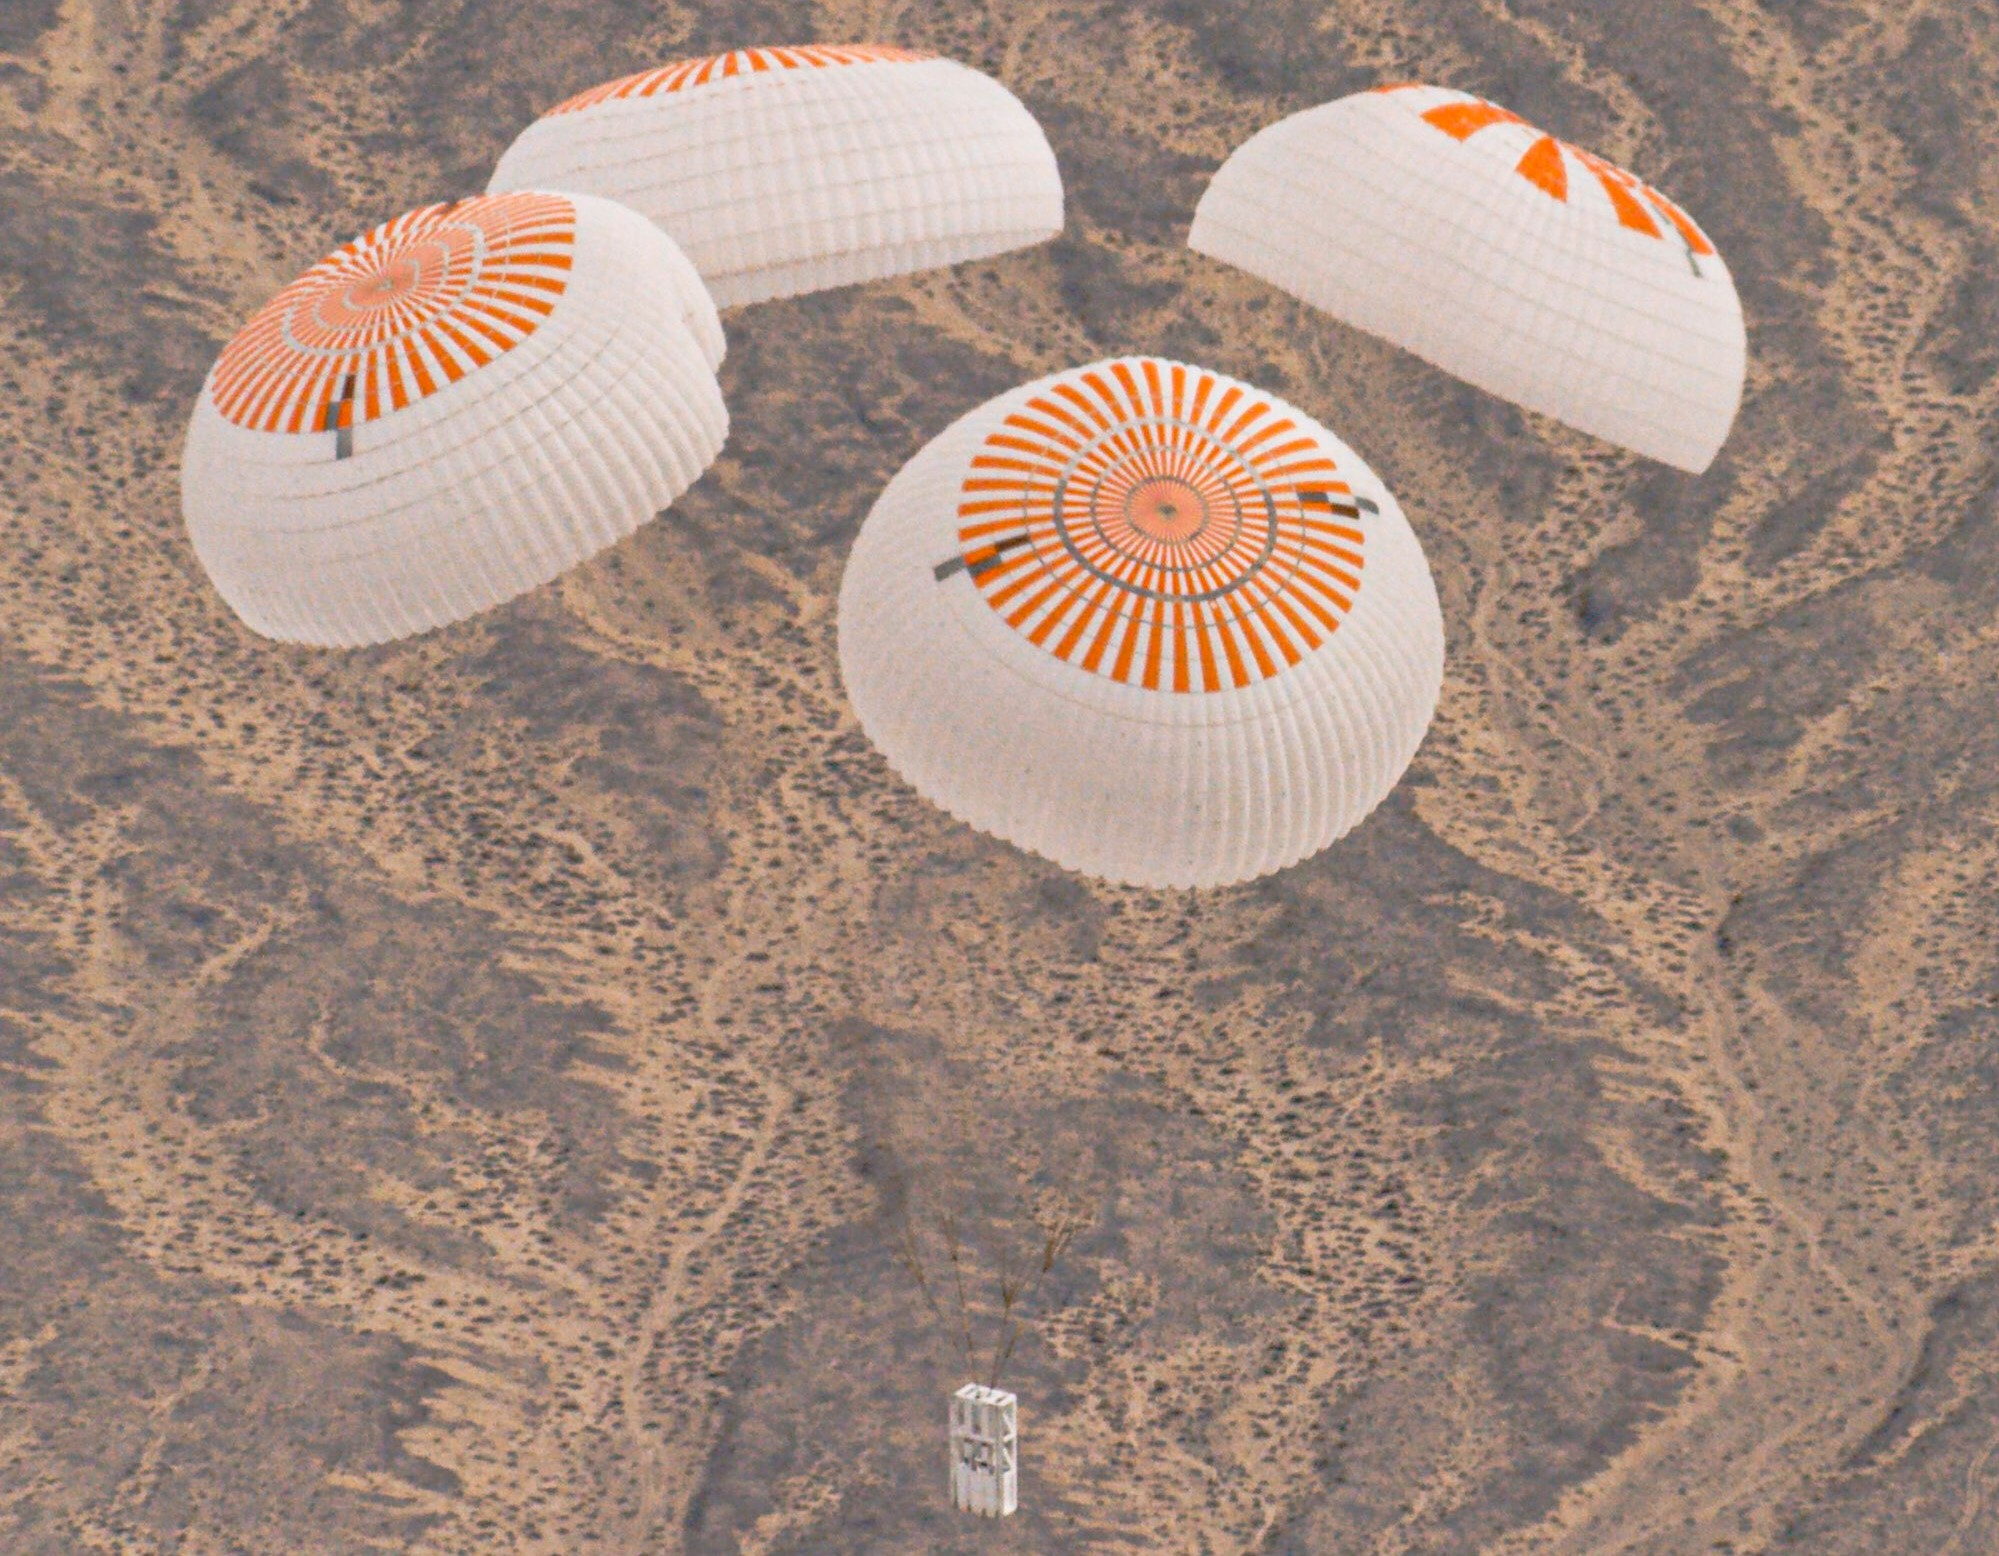 Crew Dragon Mk3 four parachute testing Nov 2019 (SpaceX) 1 crop